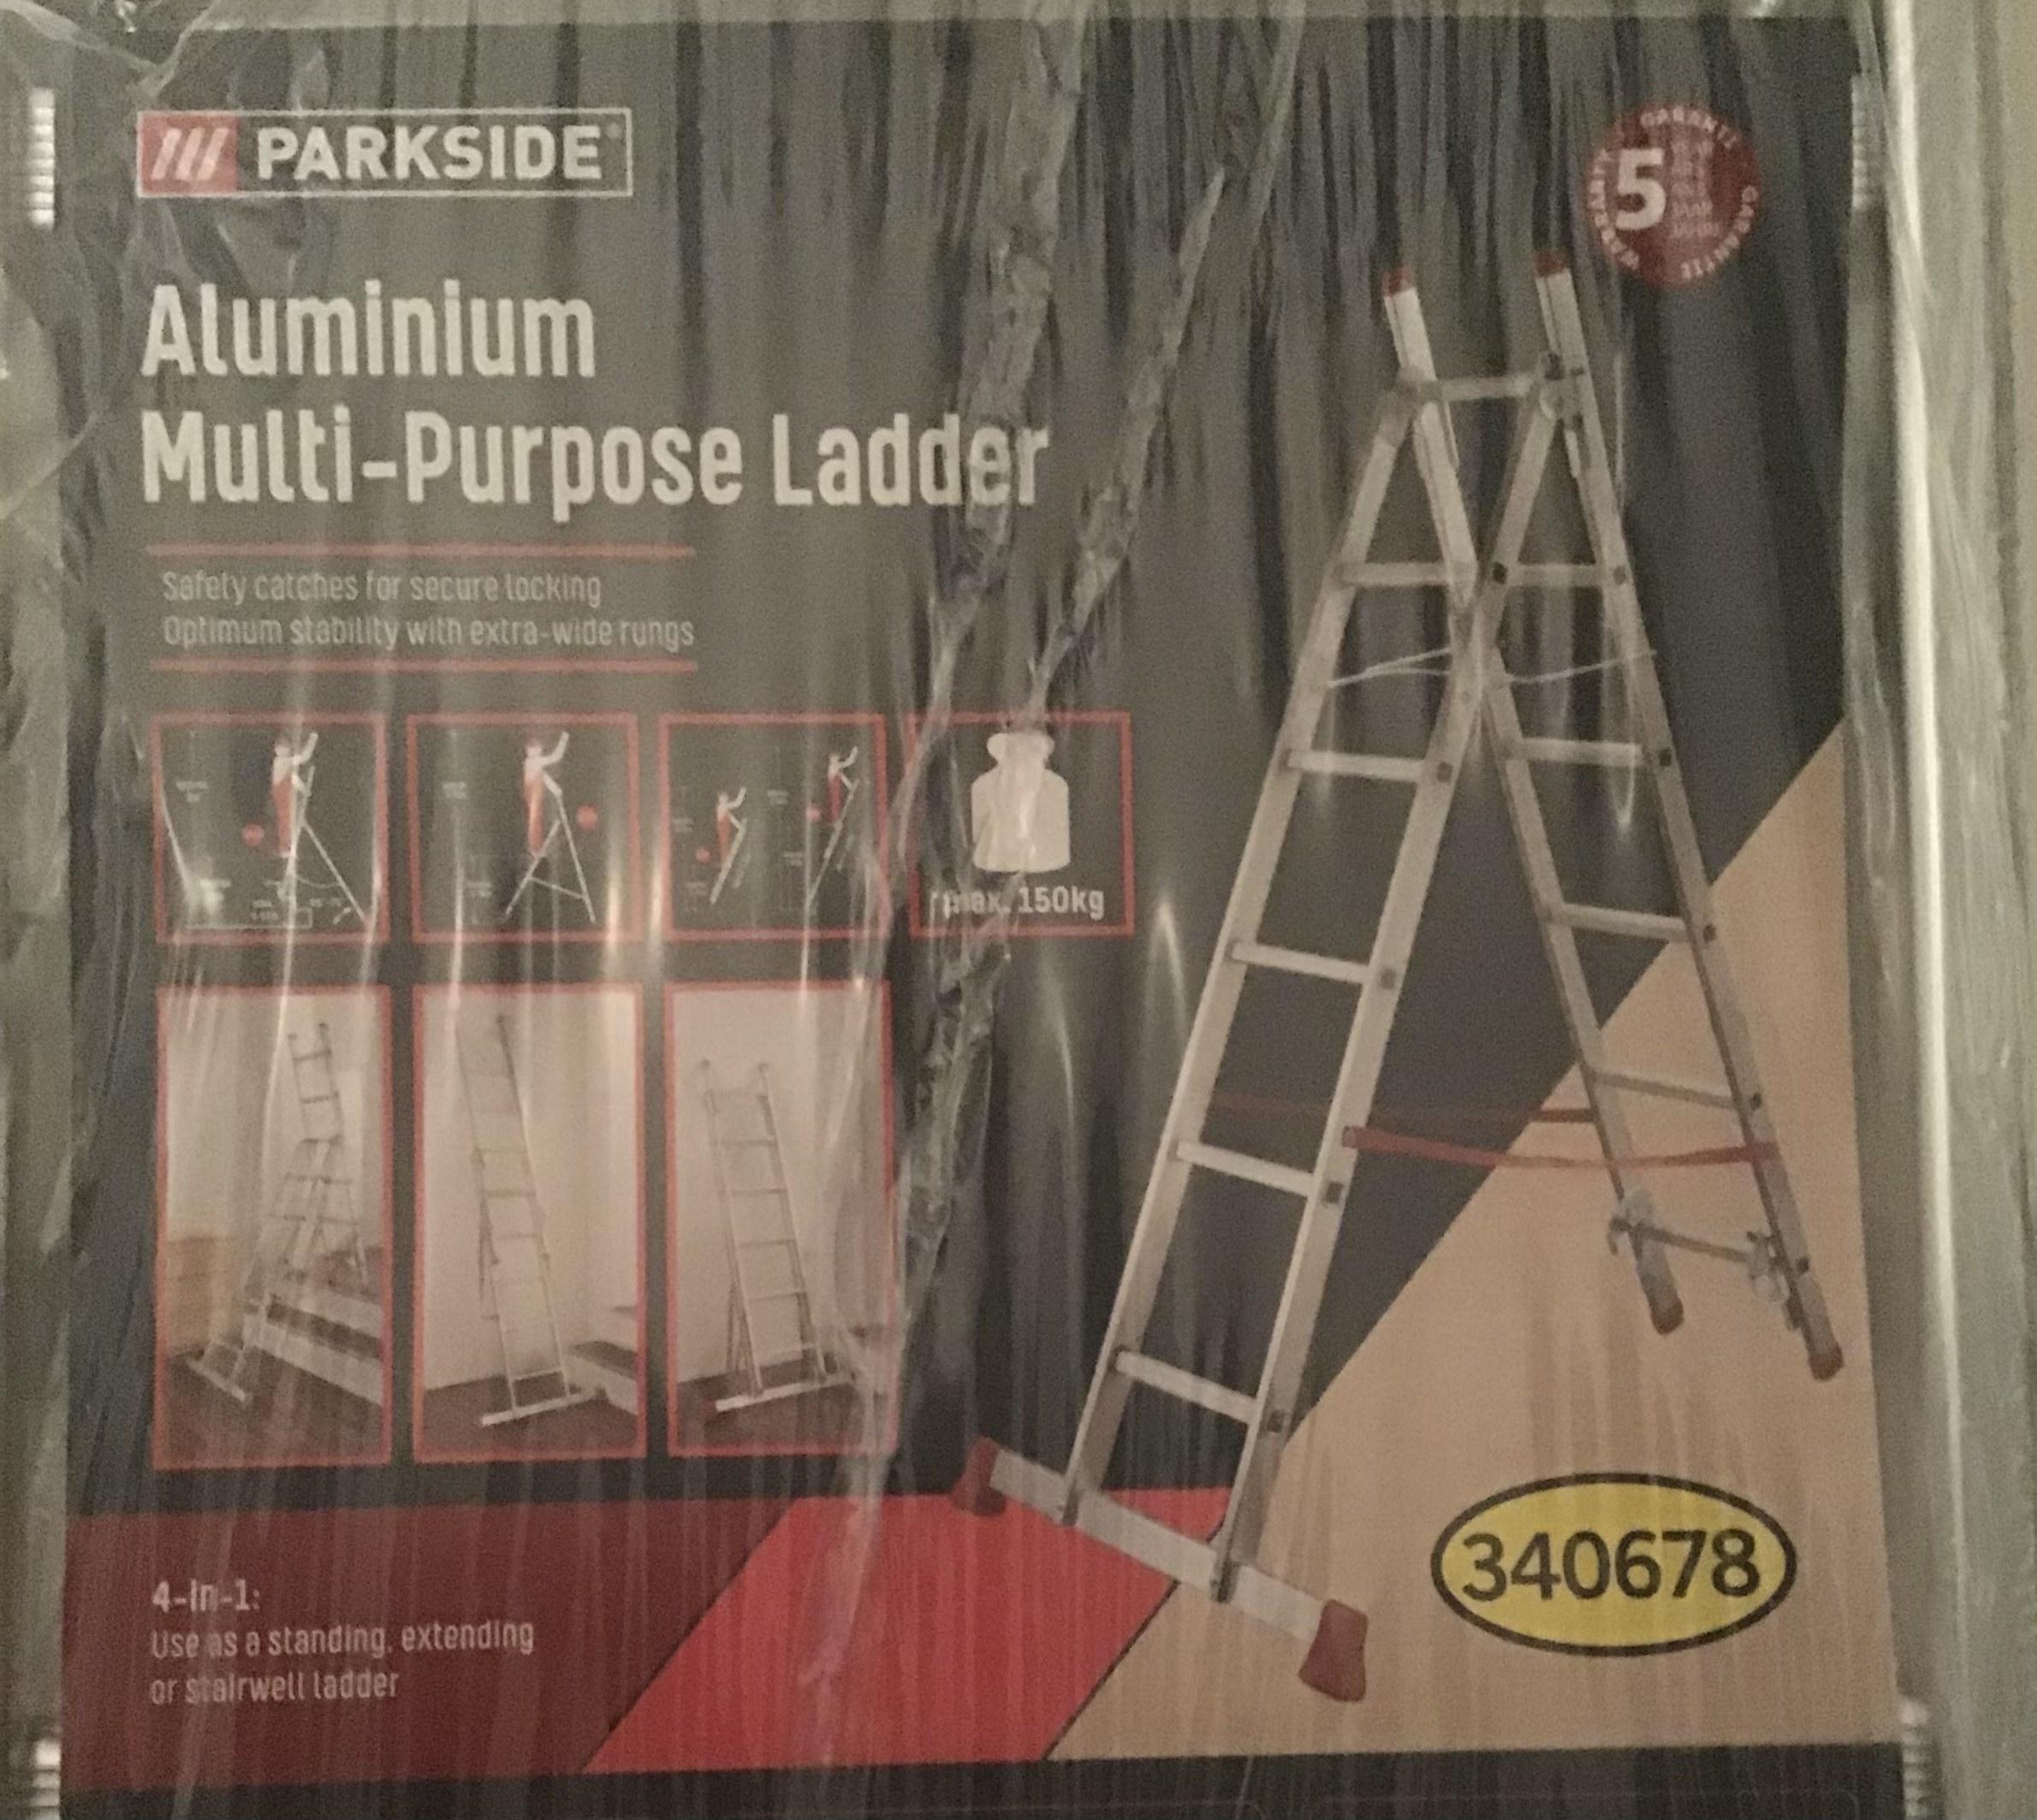 LIDL Parkside Aluminium Multi-Purpose ladder [Lokaal? Gouda]